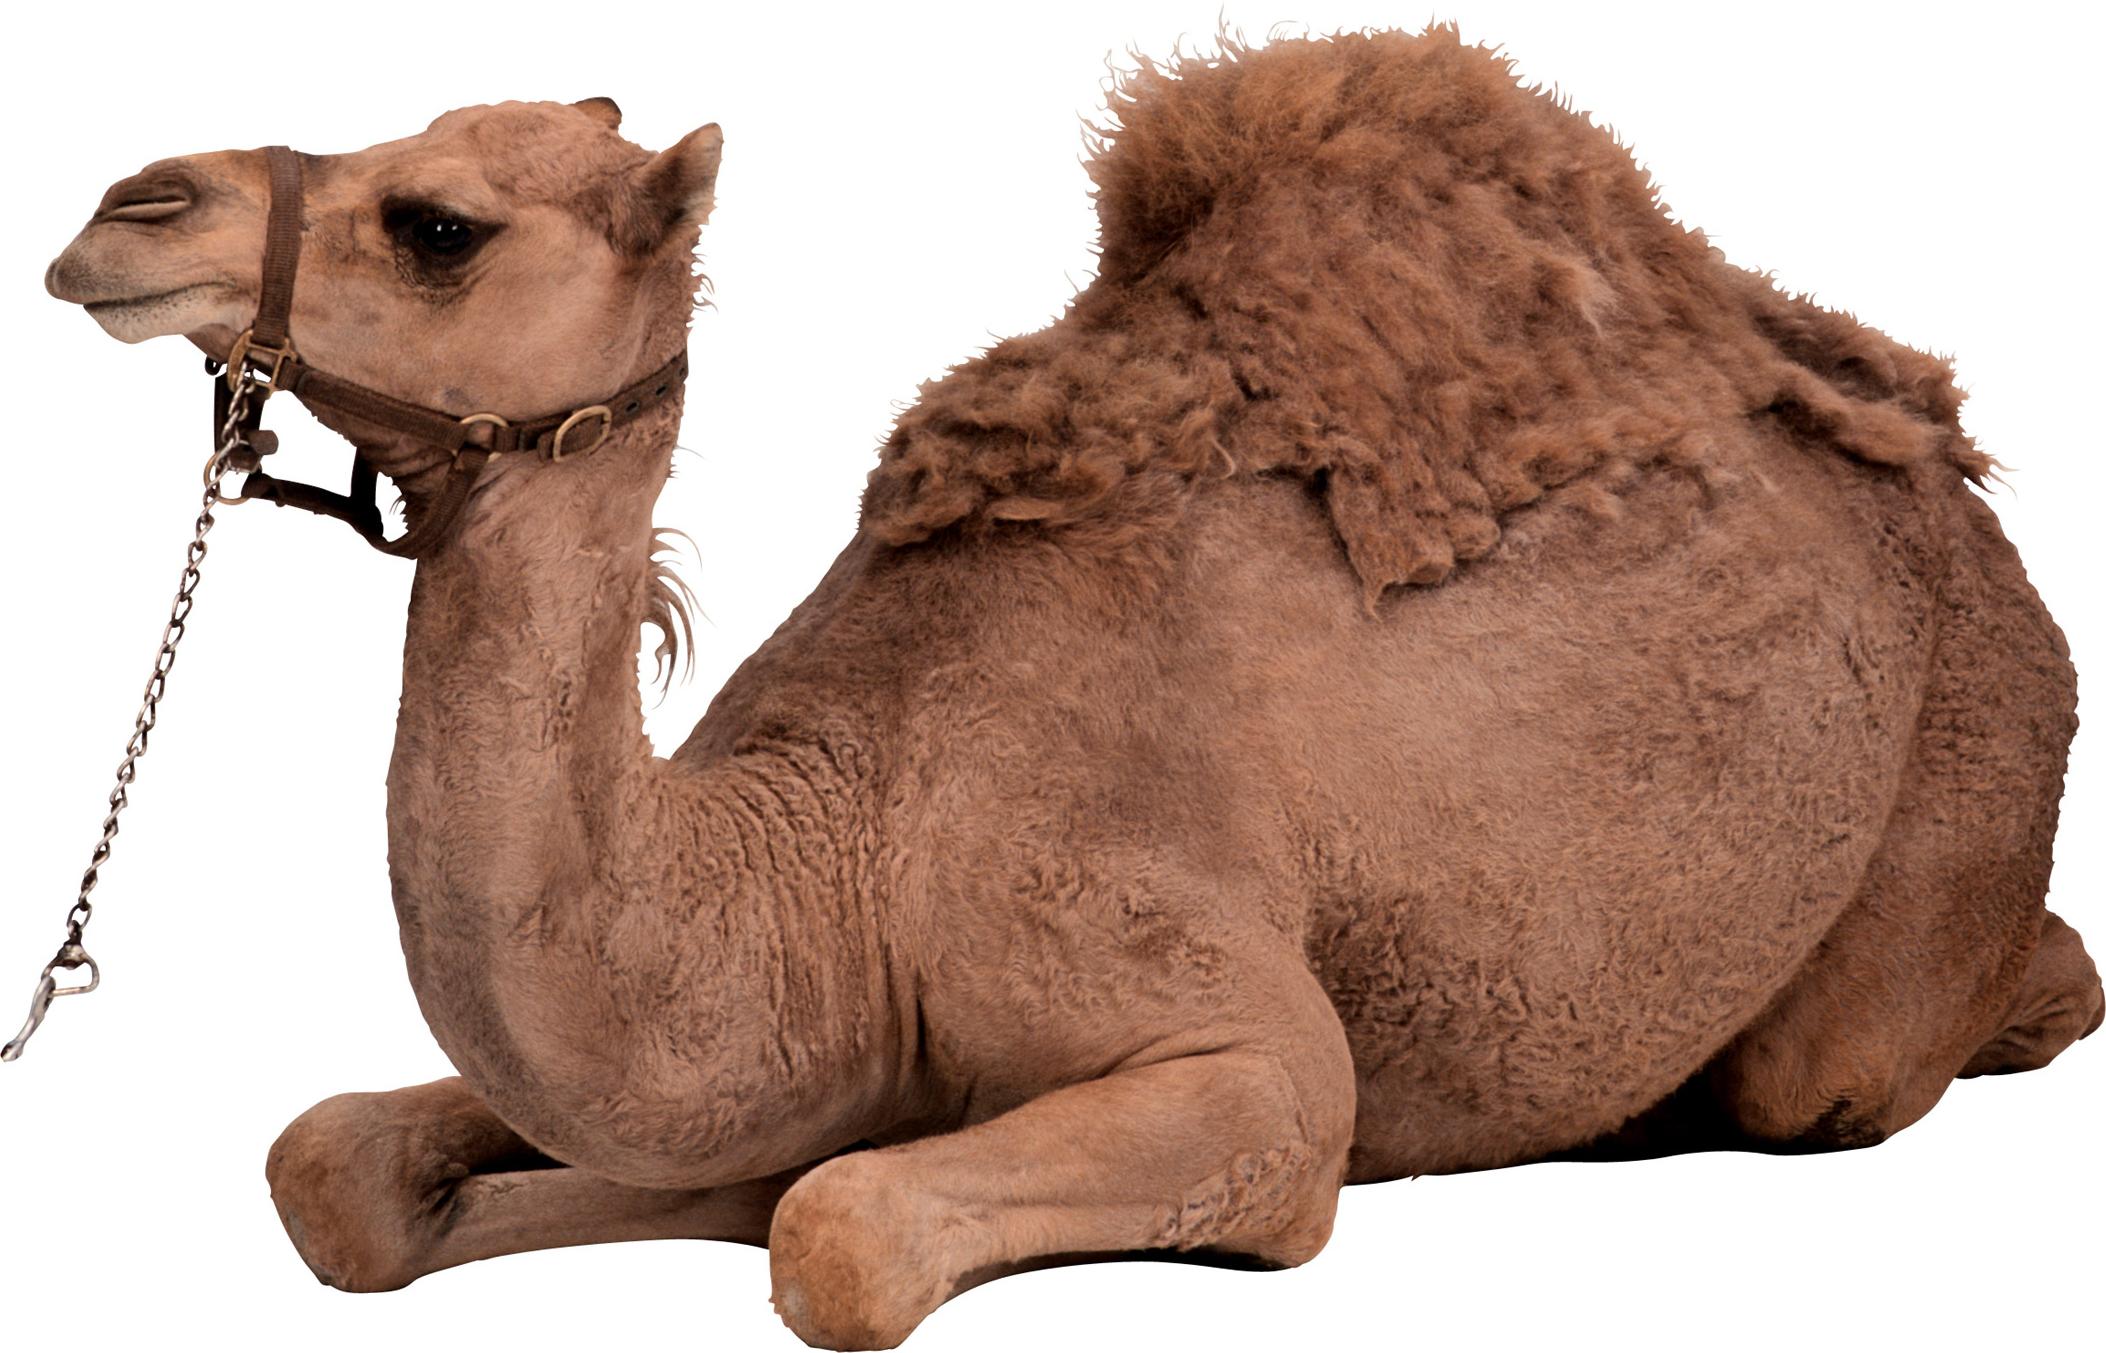 Camel Transparent PNG Image | Web Icons PNG